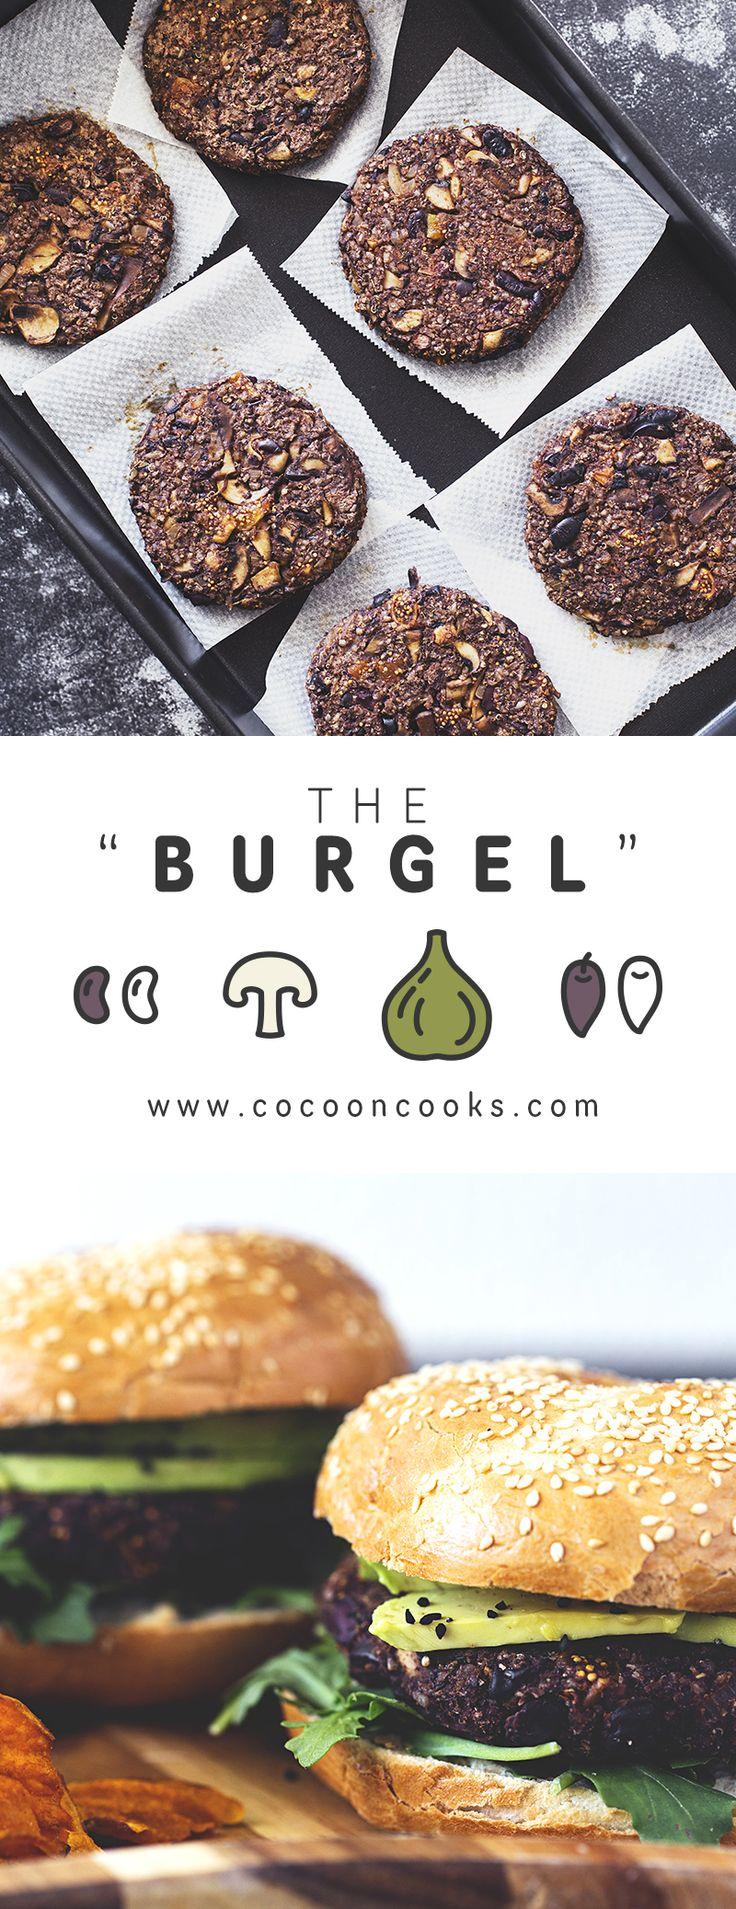 "The ""Burgel"" aka Black Bean, Mushroom, Fig & Kalamata Olive Burger in a Bagel. 100% plant-based and delicious! #vegan #recipe #burger"